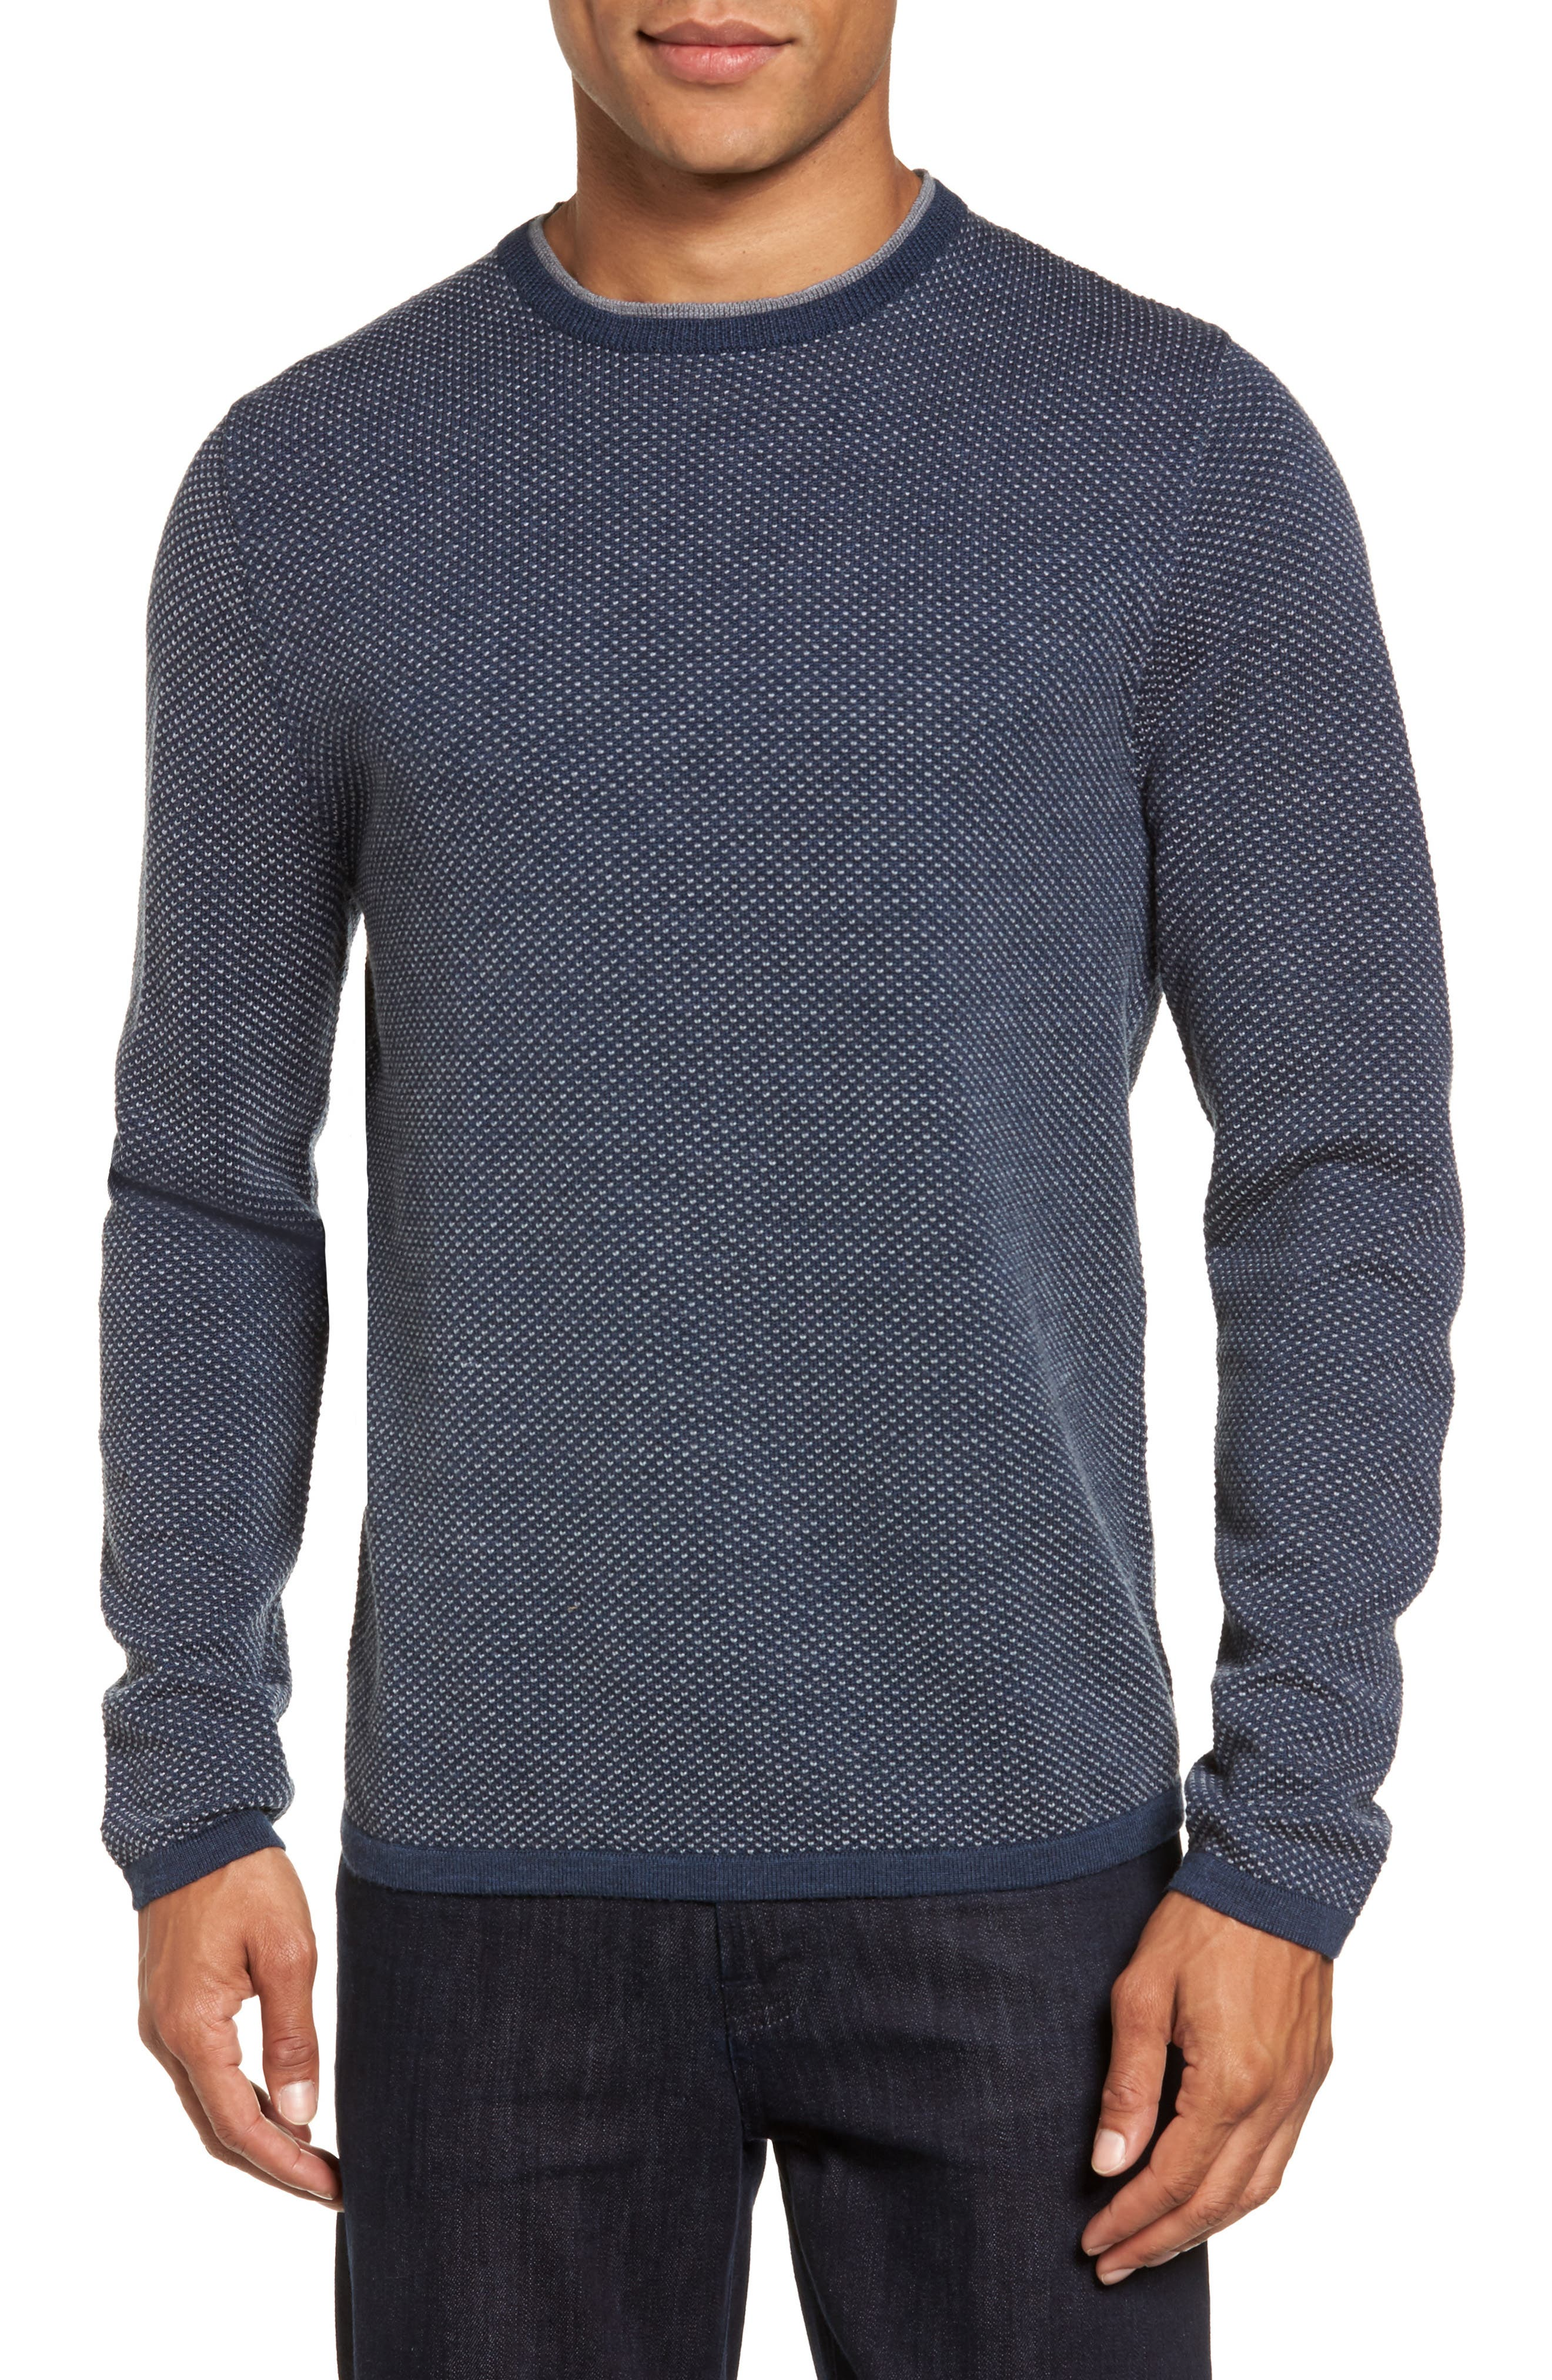 Crewneck Knit Sweater,                         Main,                         color, Navy Iris Birdseye